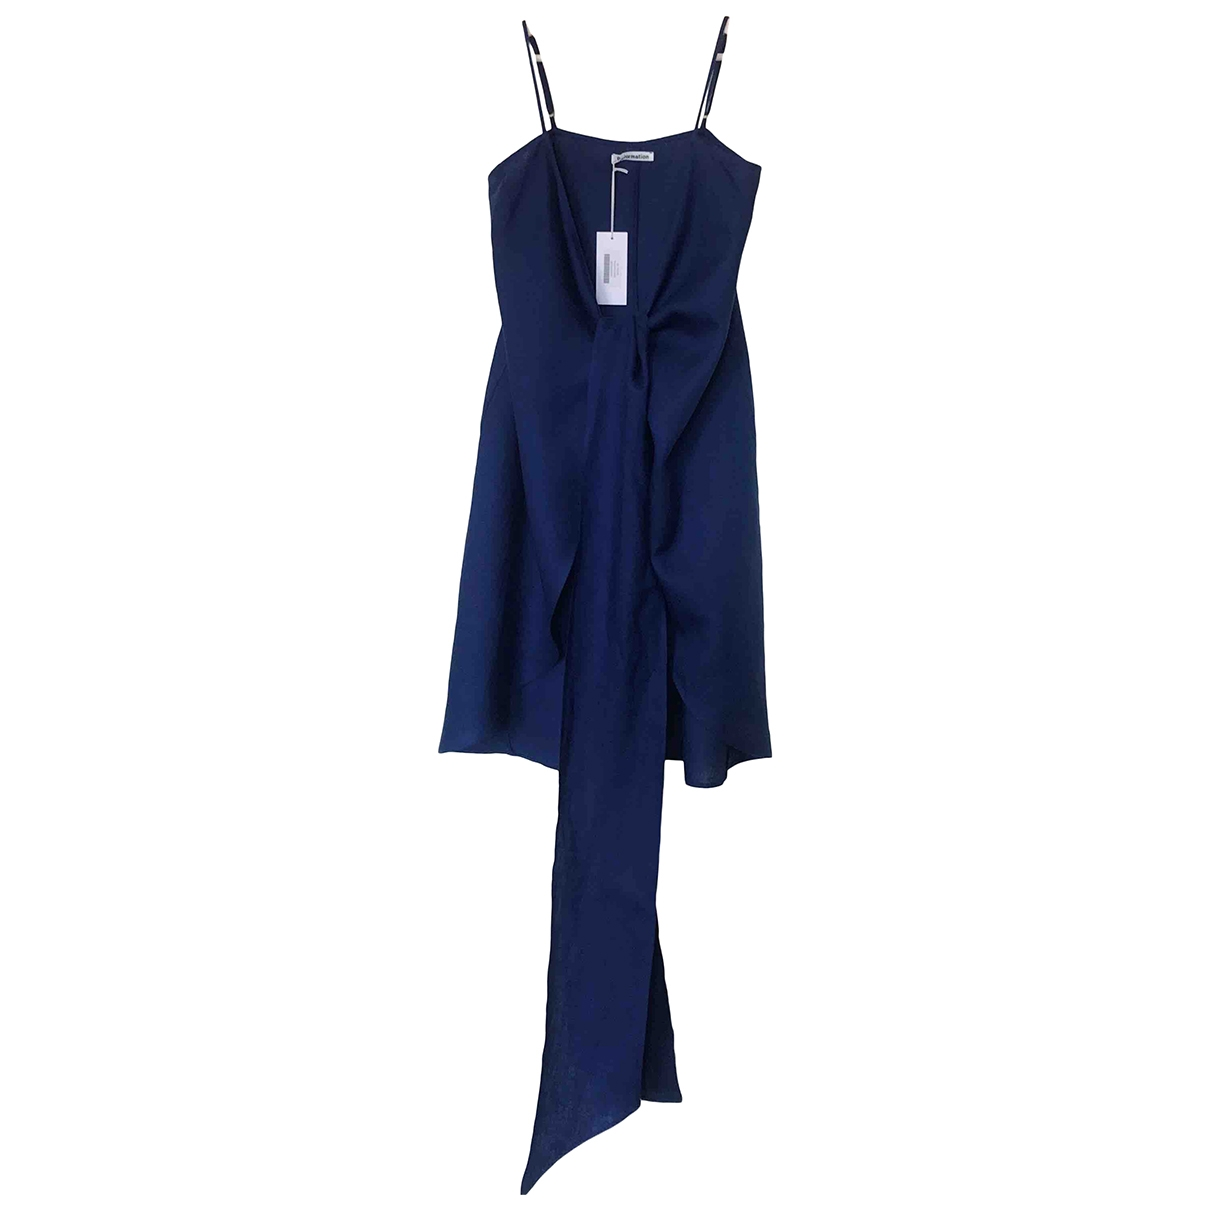 Reformation - Robe   pour femme en lin - bleu